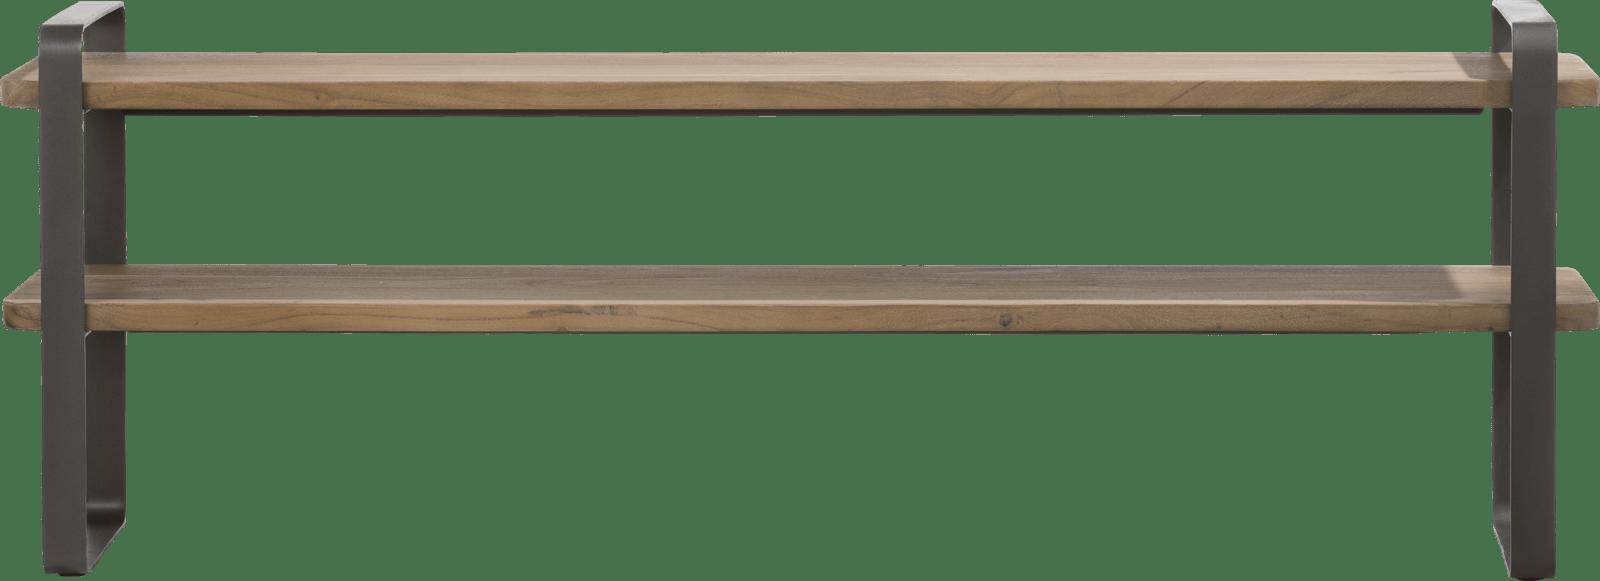 Coco Maison - lowboard rosetta - 144,5 cm